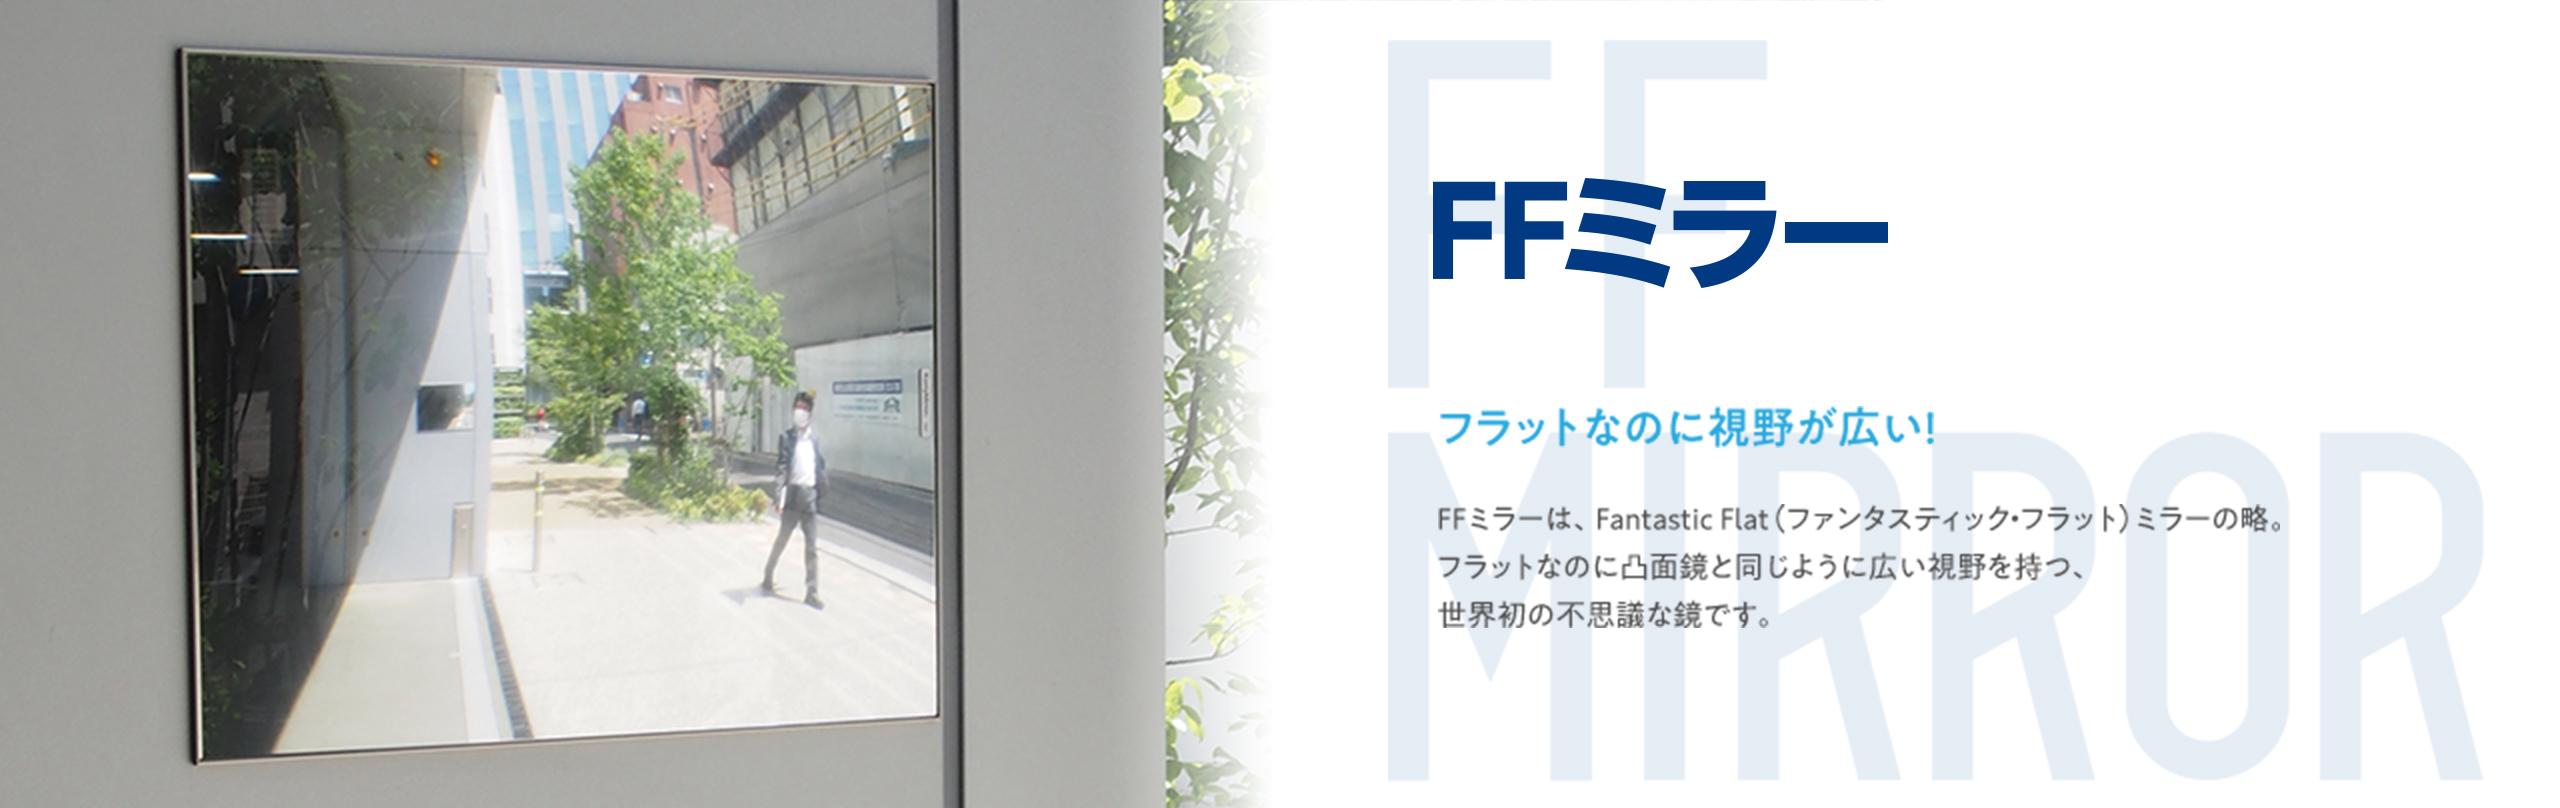 FFミラーの特徴